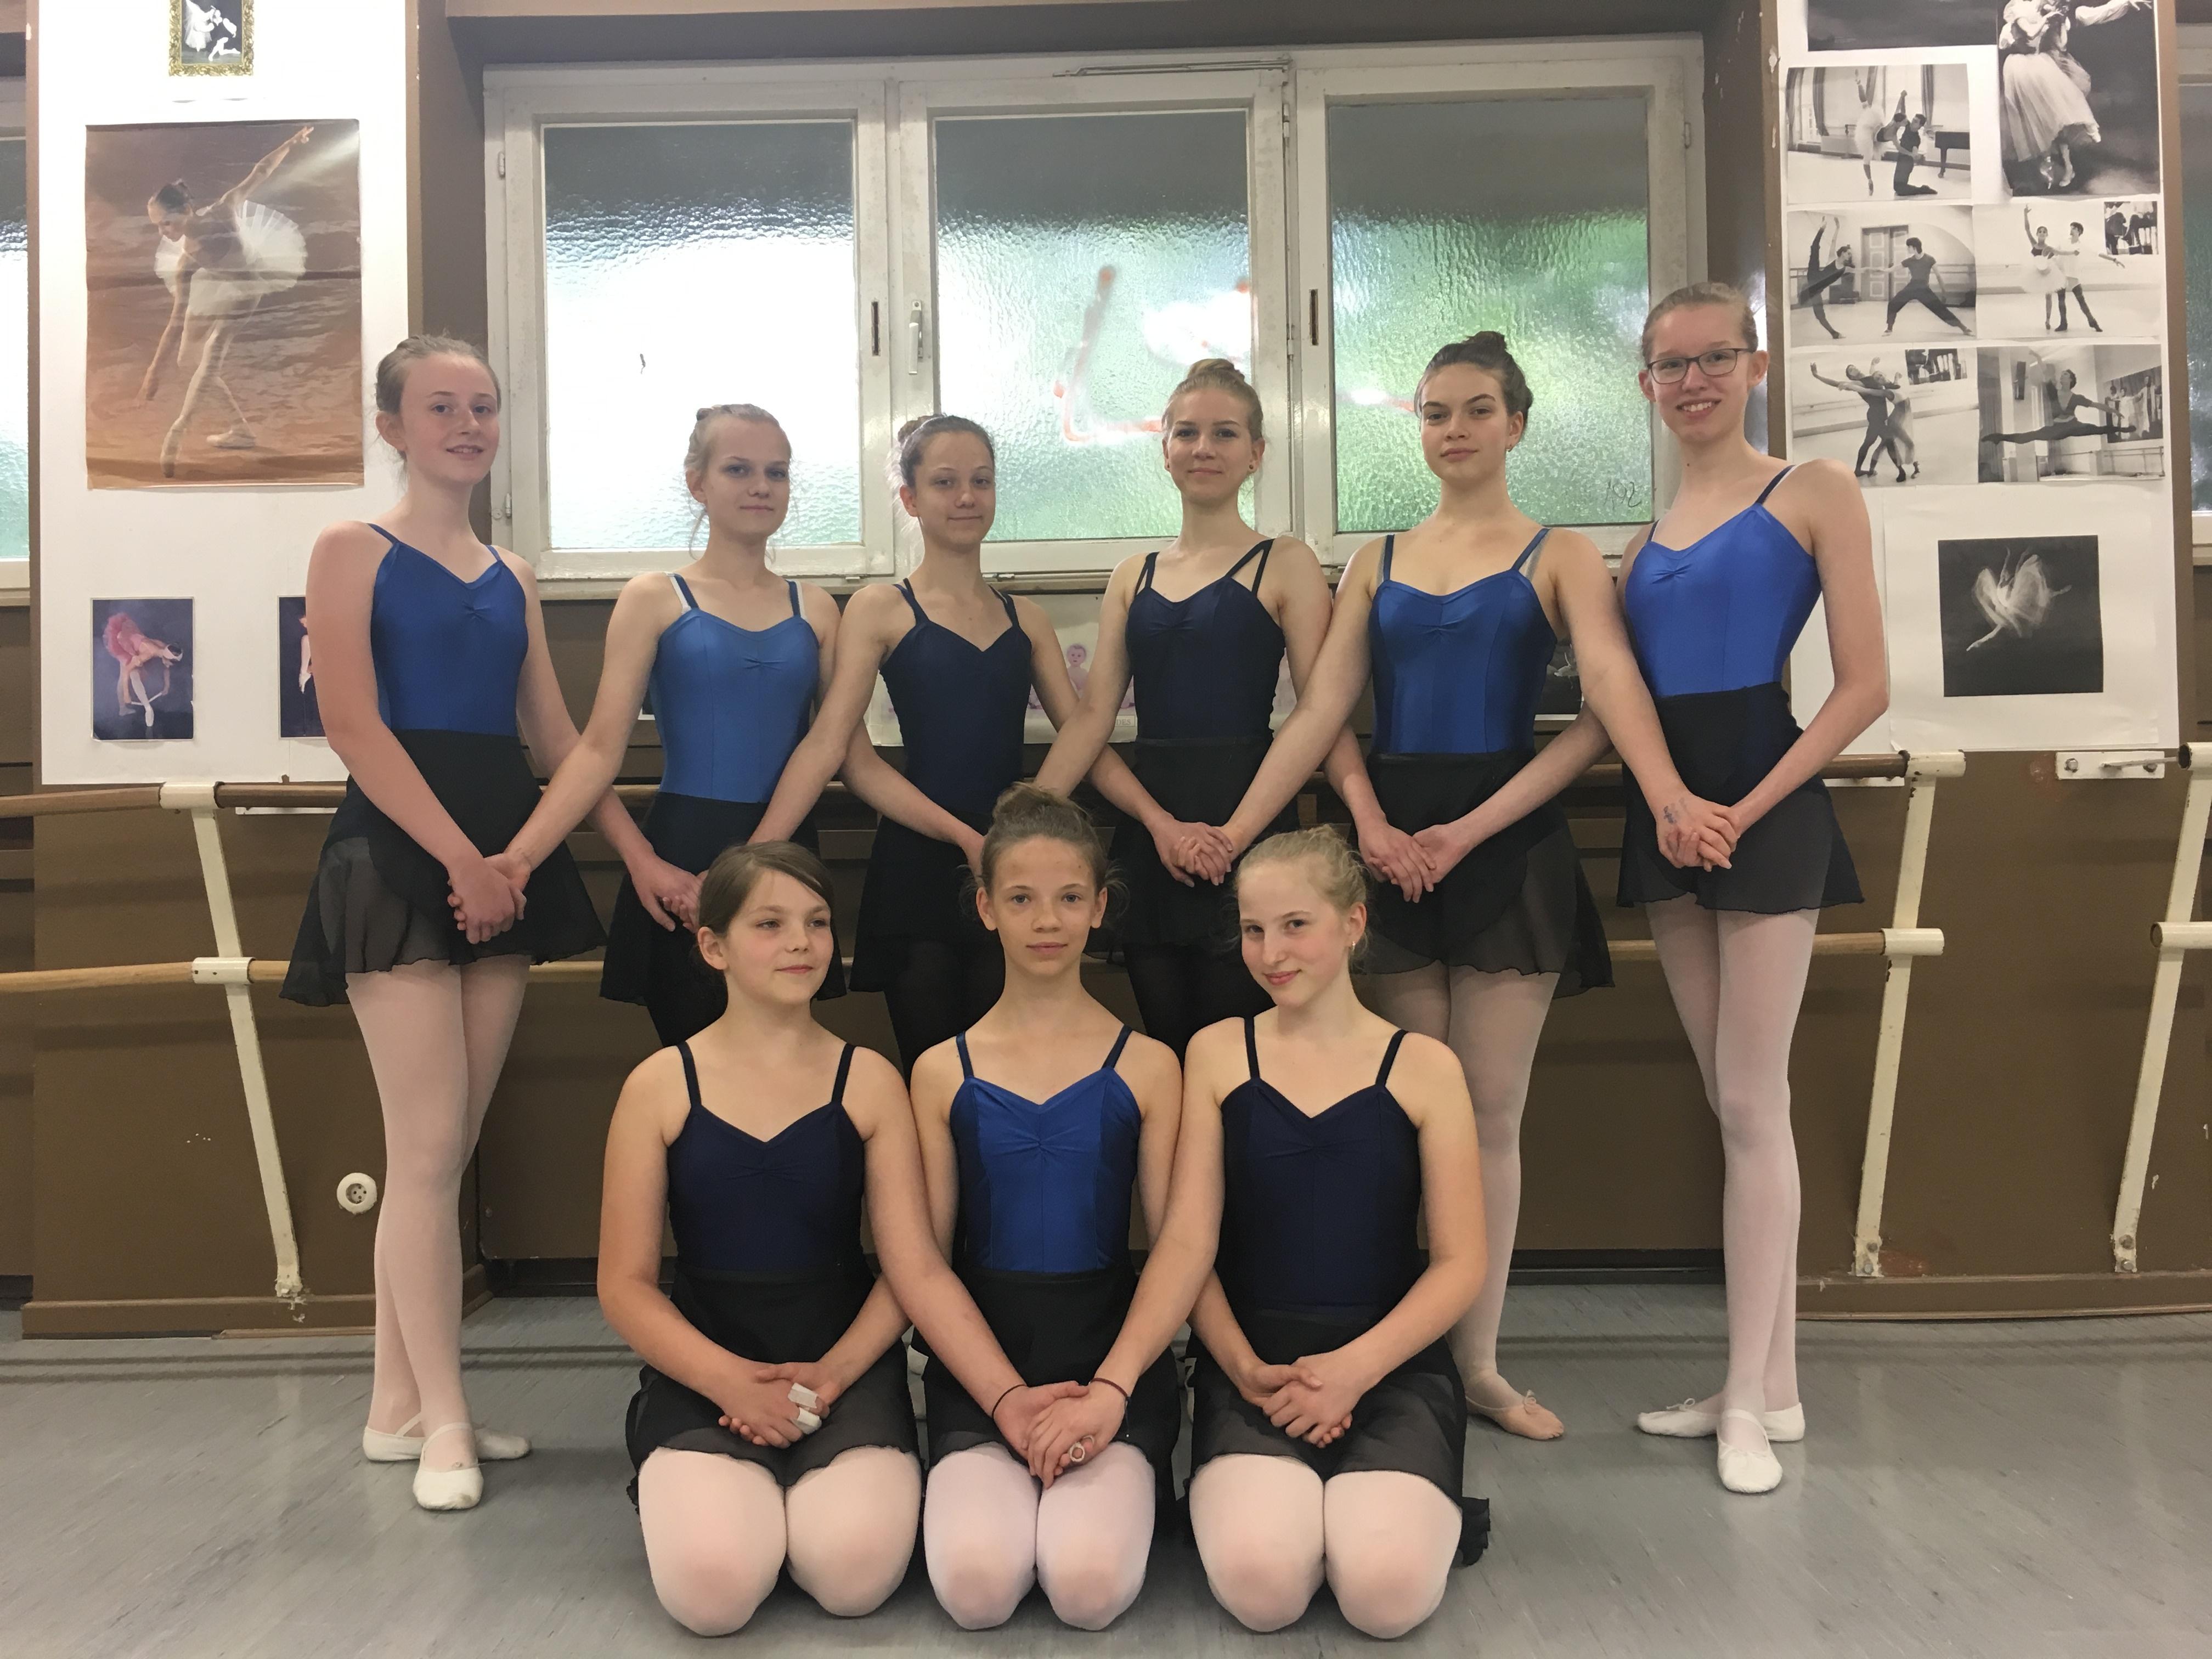 Ballett%2011-15